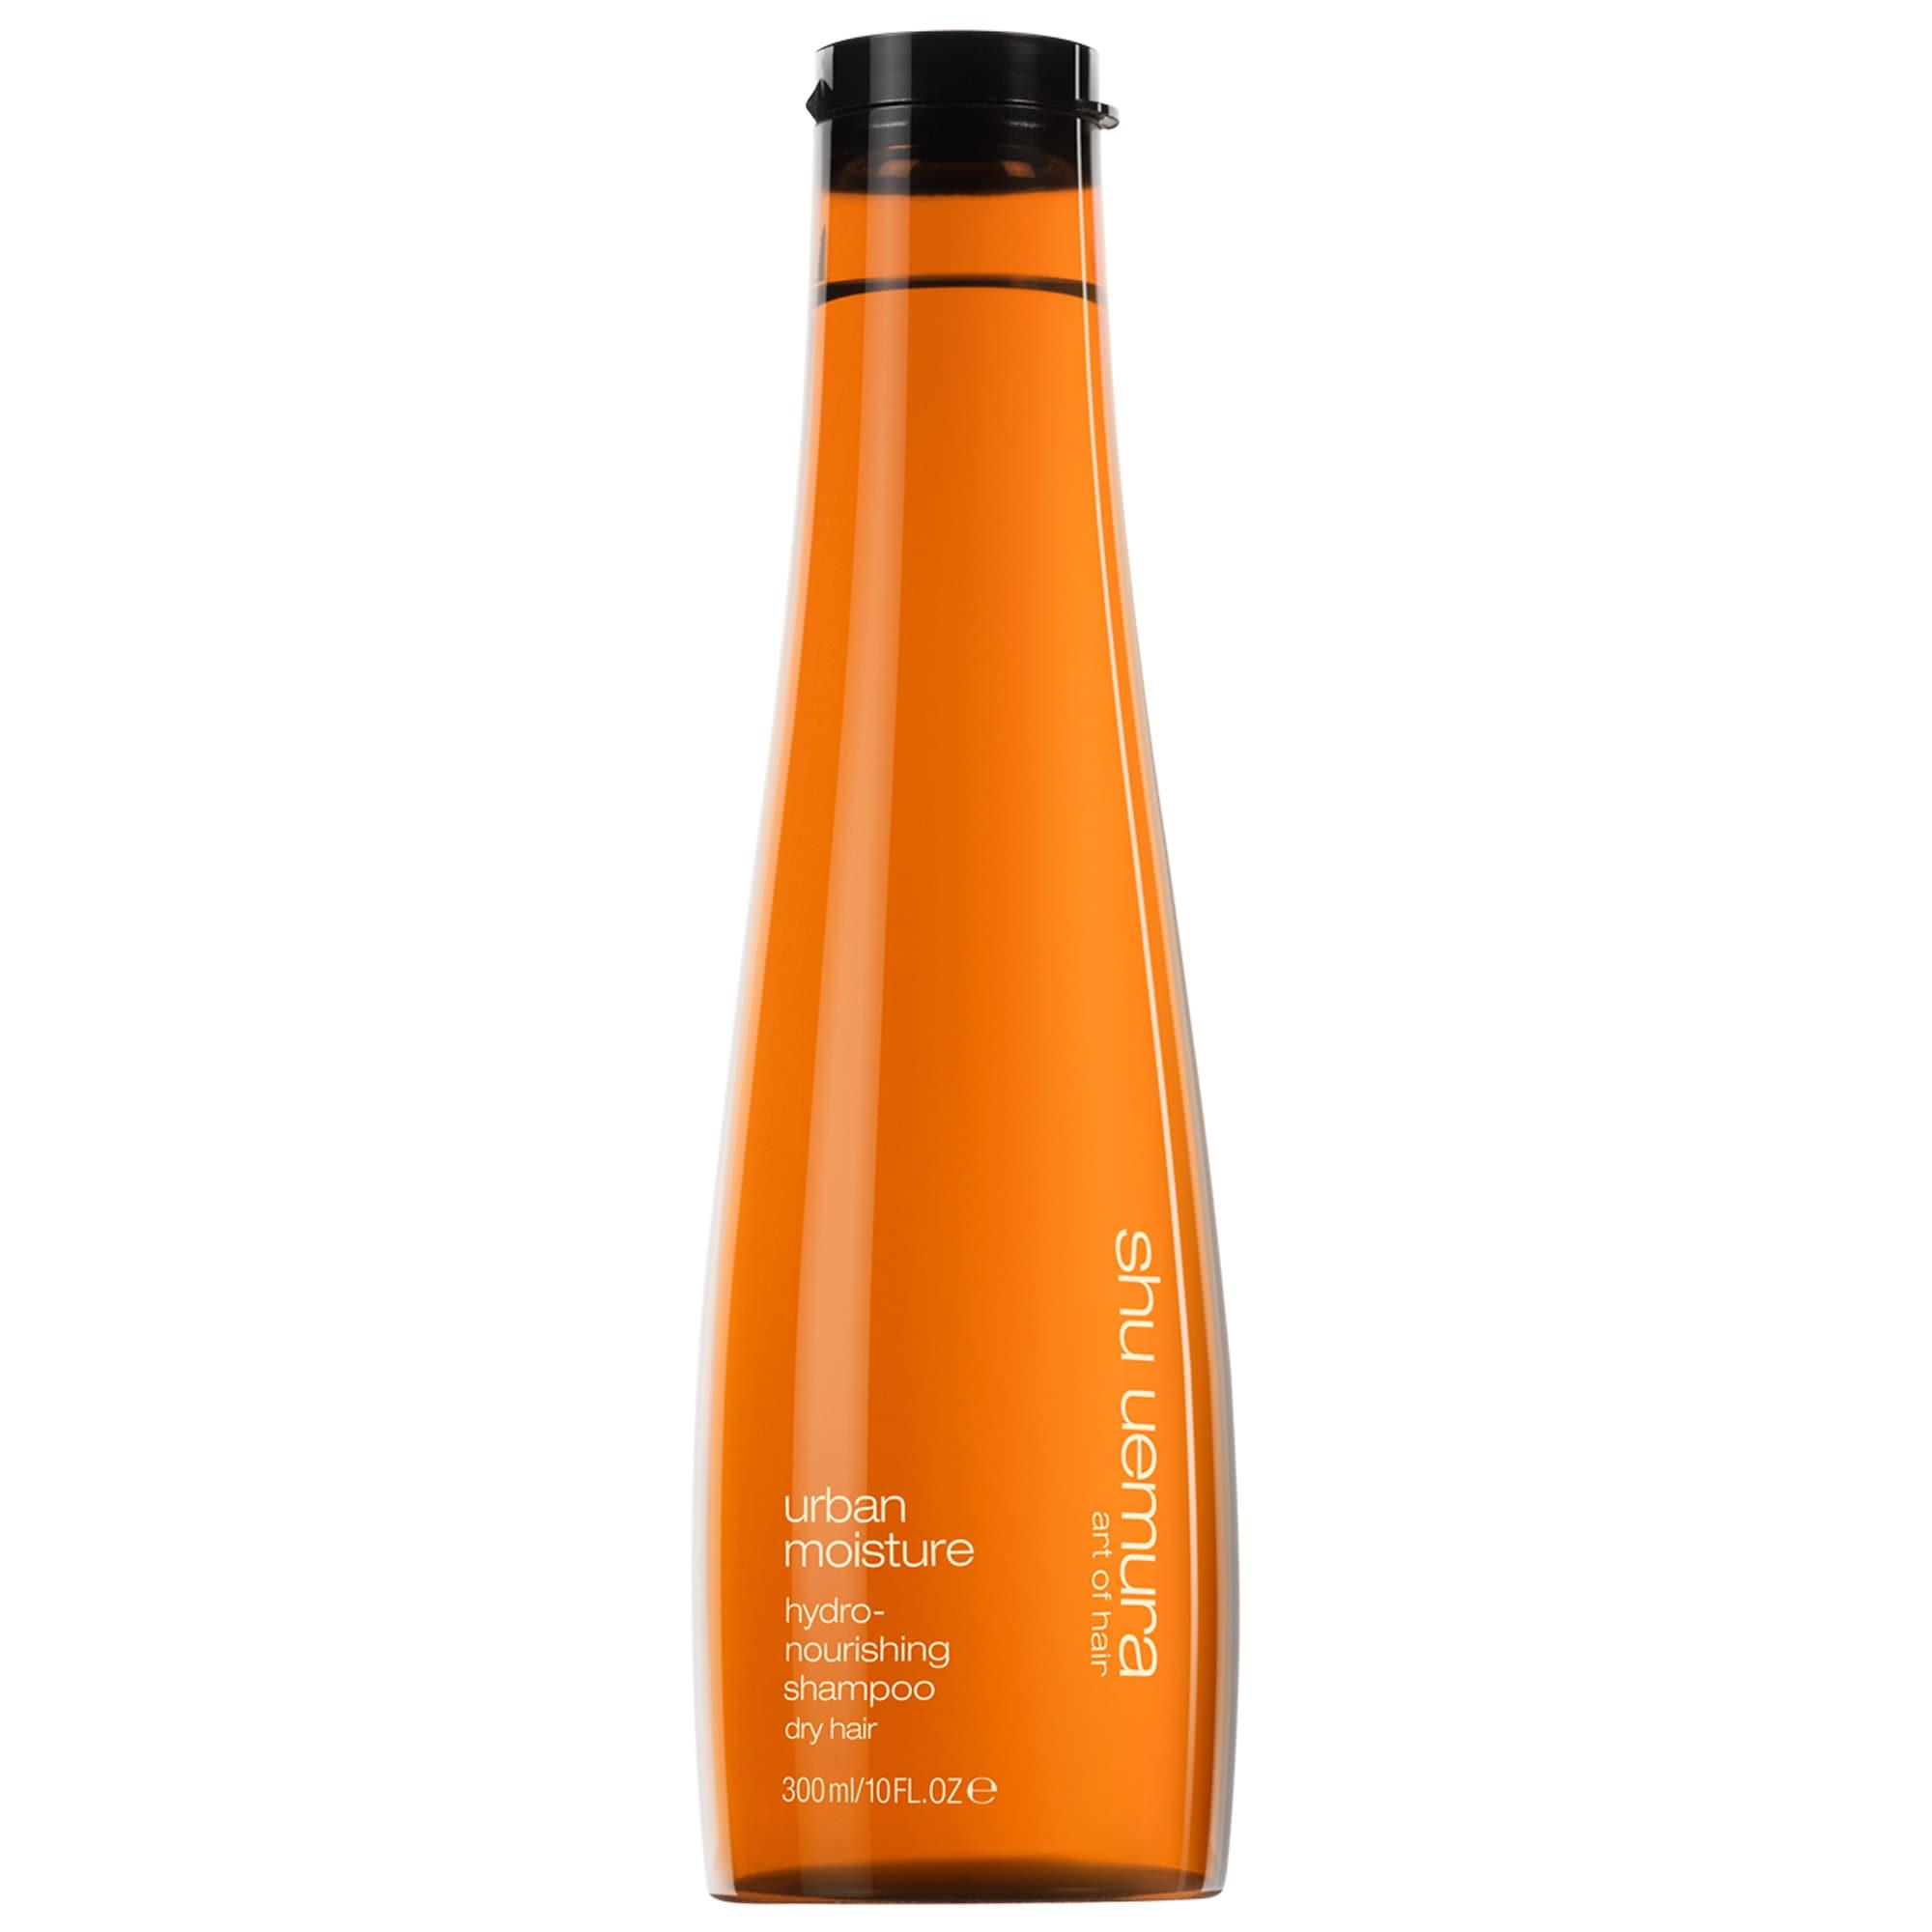 Shu Uemura - Urban Moisture Hydro-Nourishing Shampoo